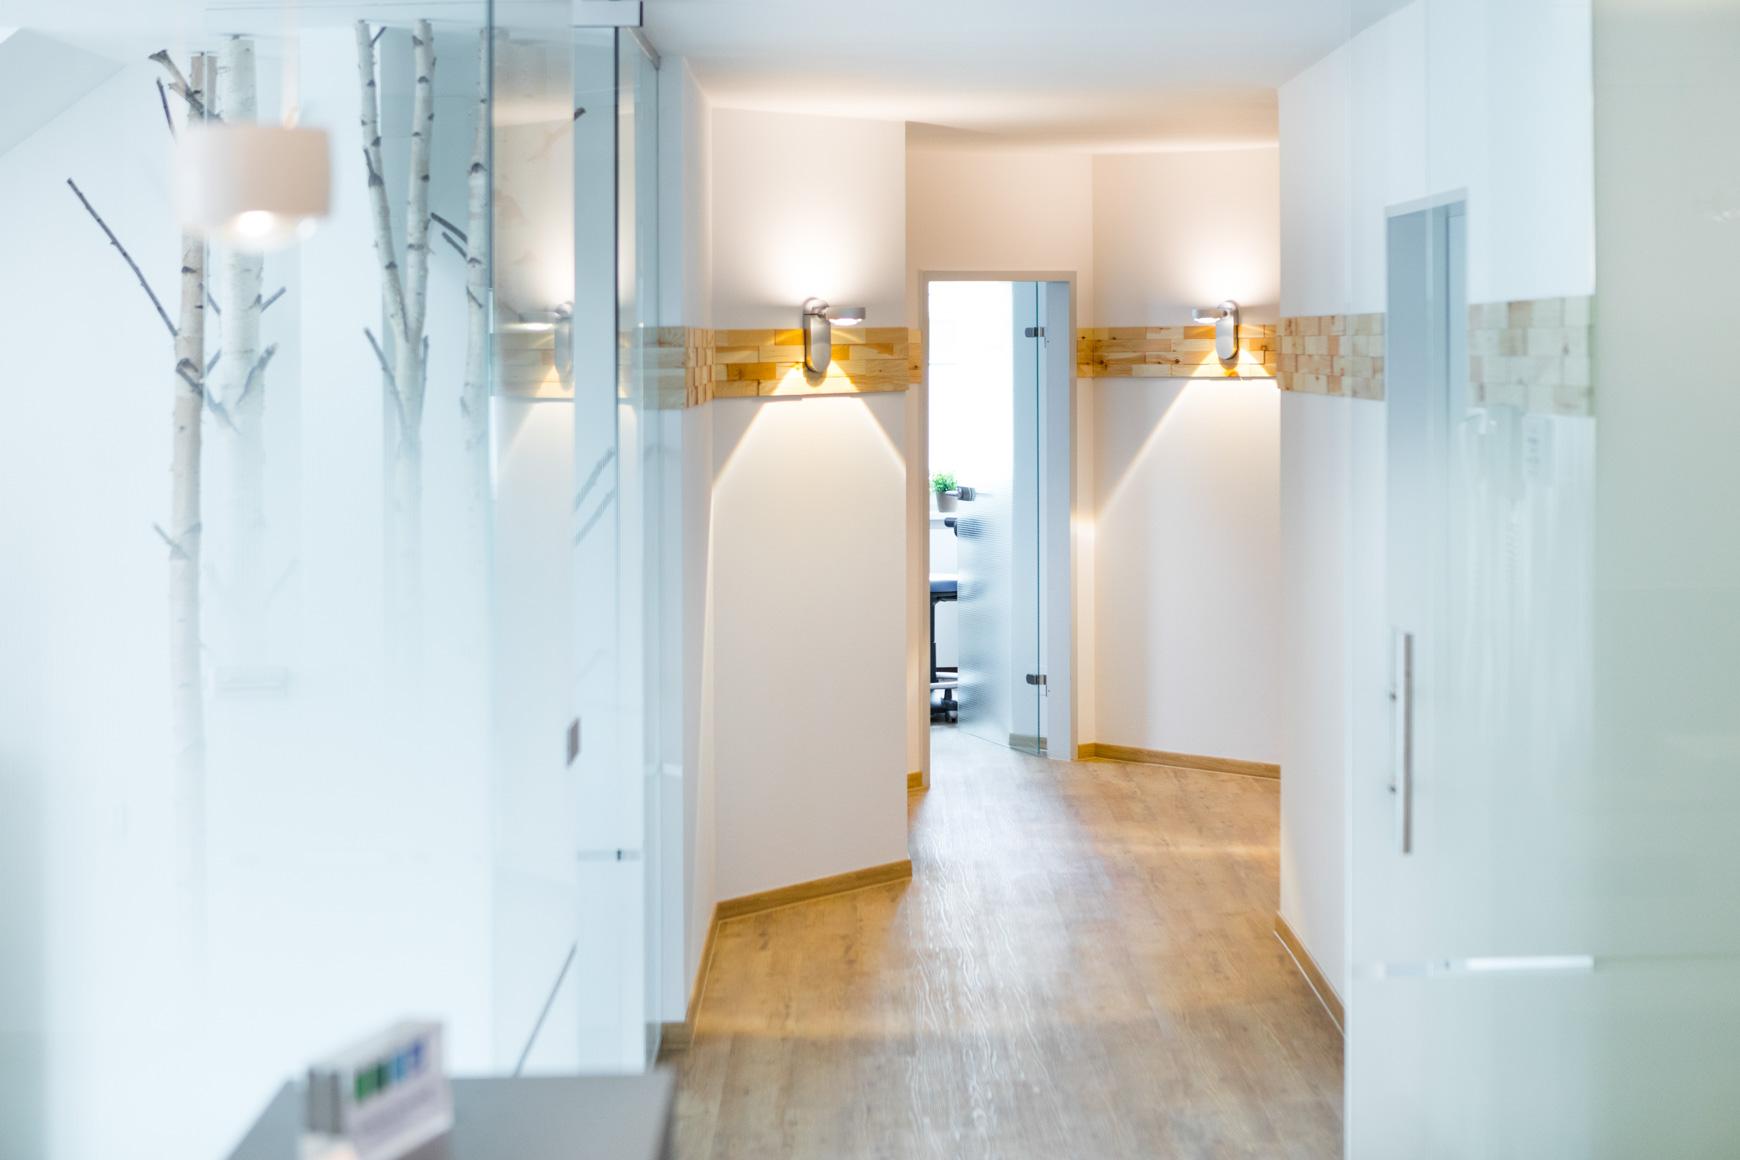 Rooms & Places Schaufenster